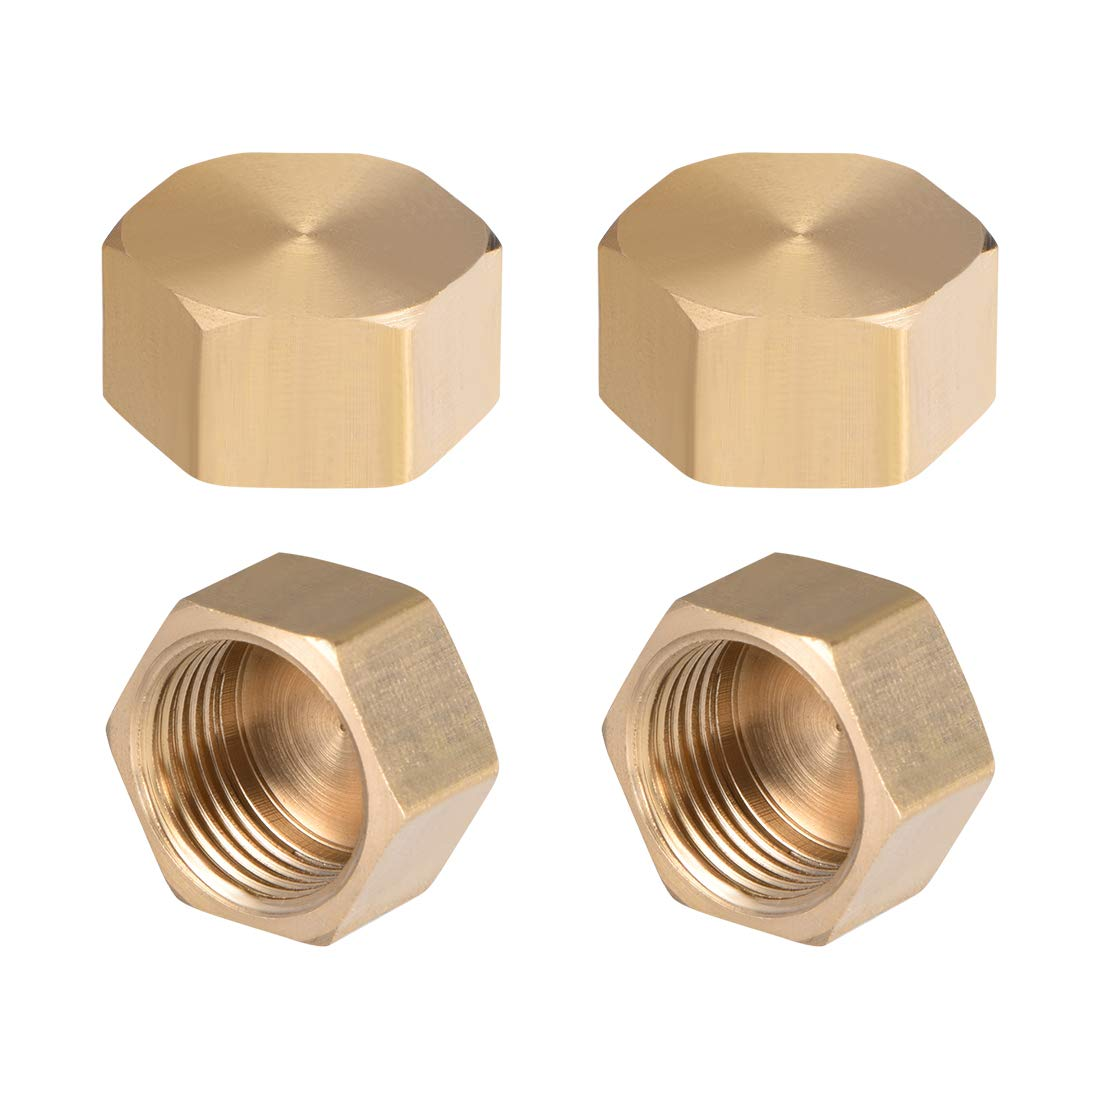 raccord de tuyau hexagonal 2,5 cm 1//8 1//4 1//2 3//4 G femelle Sourcing map Capuchon en laiton